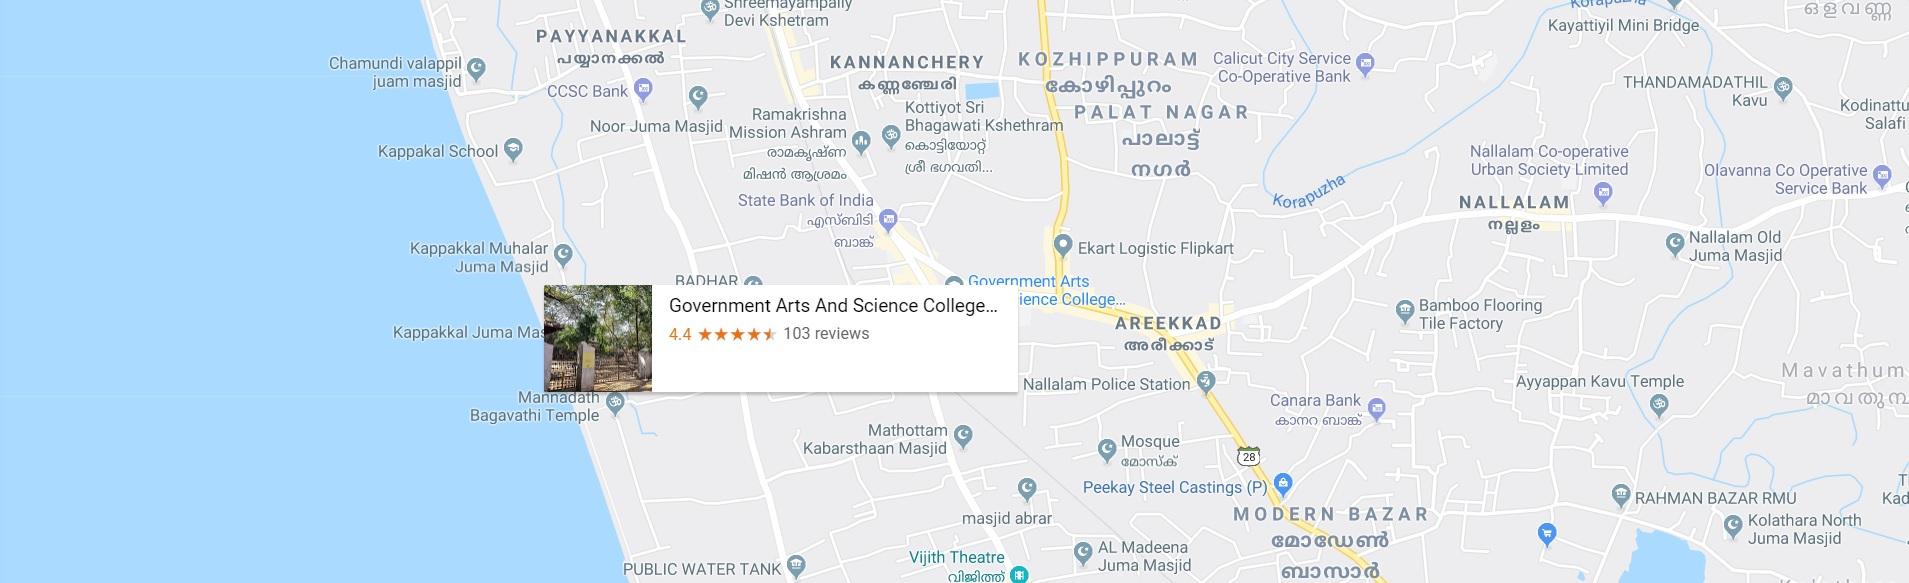 Govt arts college map